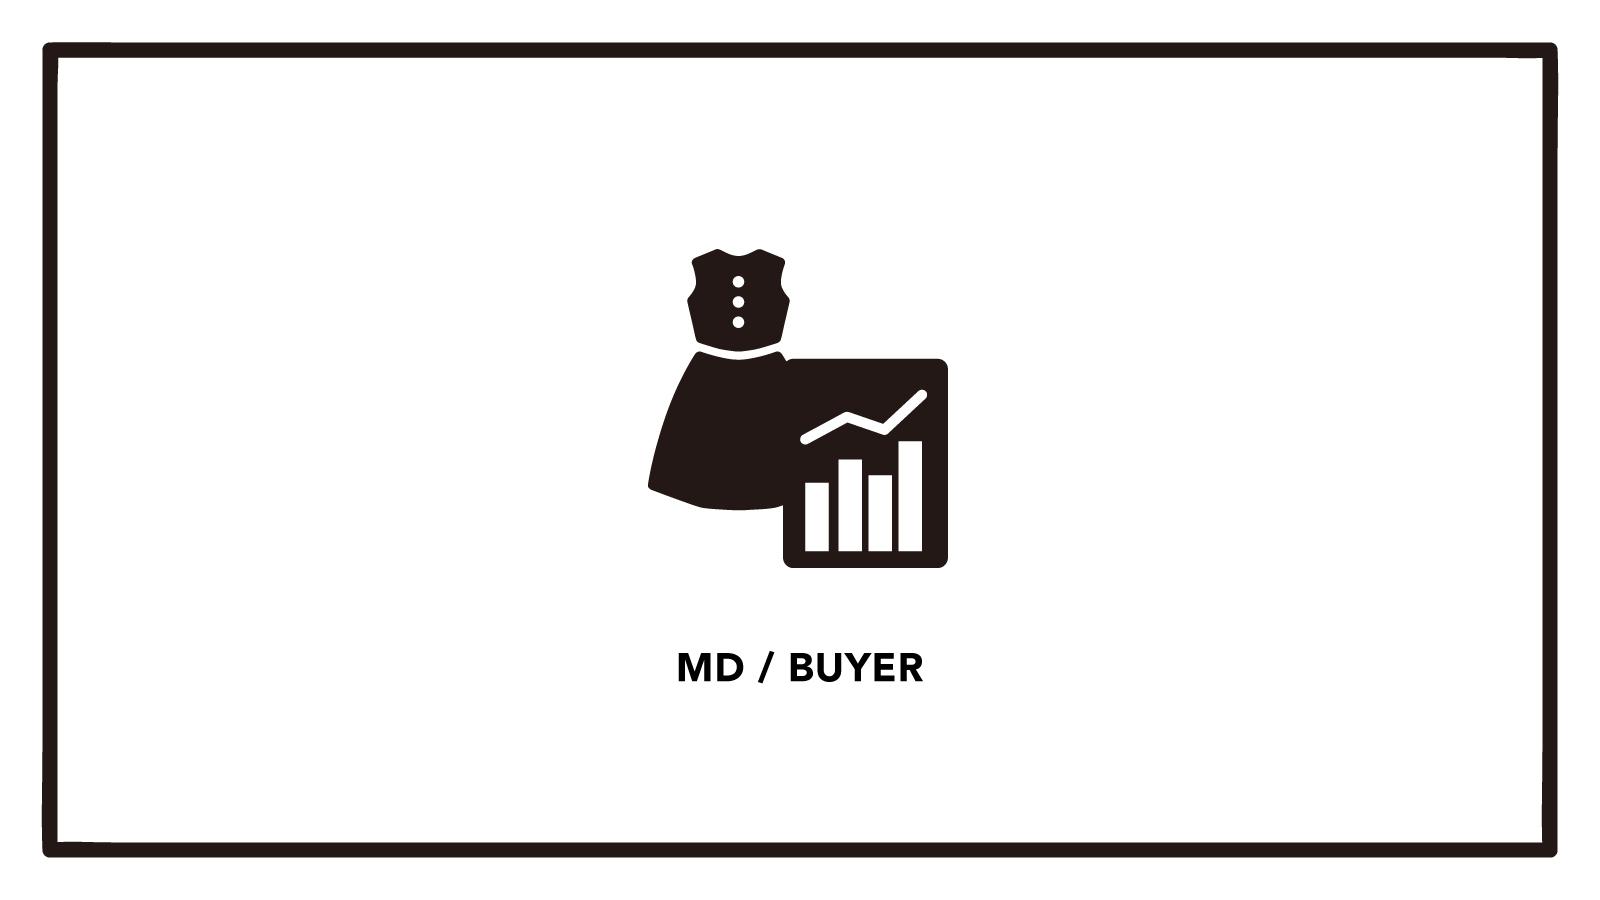 【MD】急成長中のアパレルメーカー 都市部に続々と店舗展開!のカバー写真